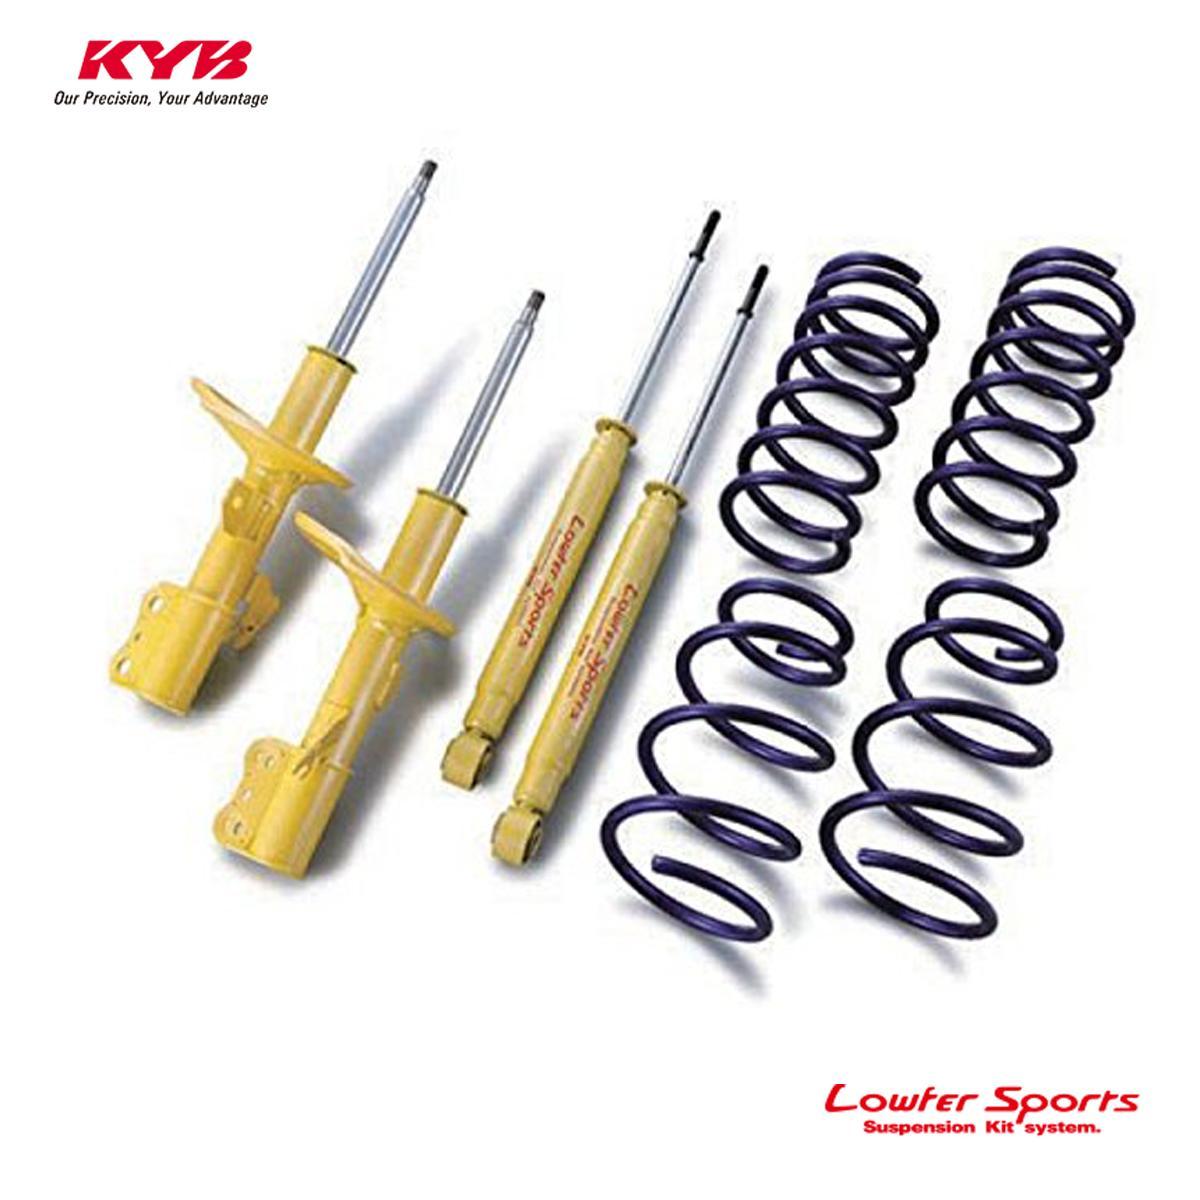 KYB カヤバ エスティマT MCR30W ショックアブソーバー サスペンションキット Lowfer Sports LKIT-MCR30W 配送先条件有り